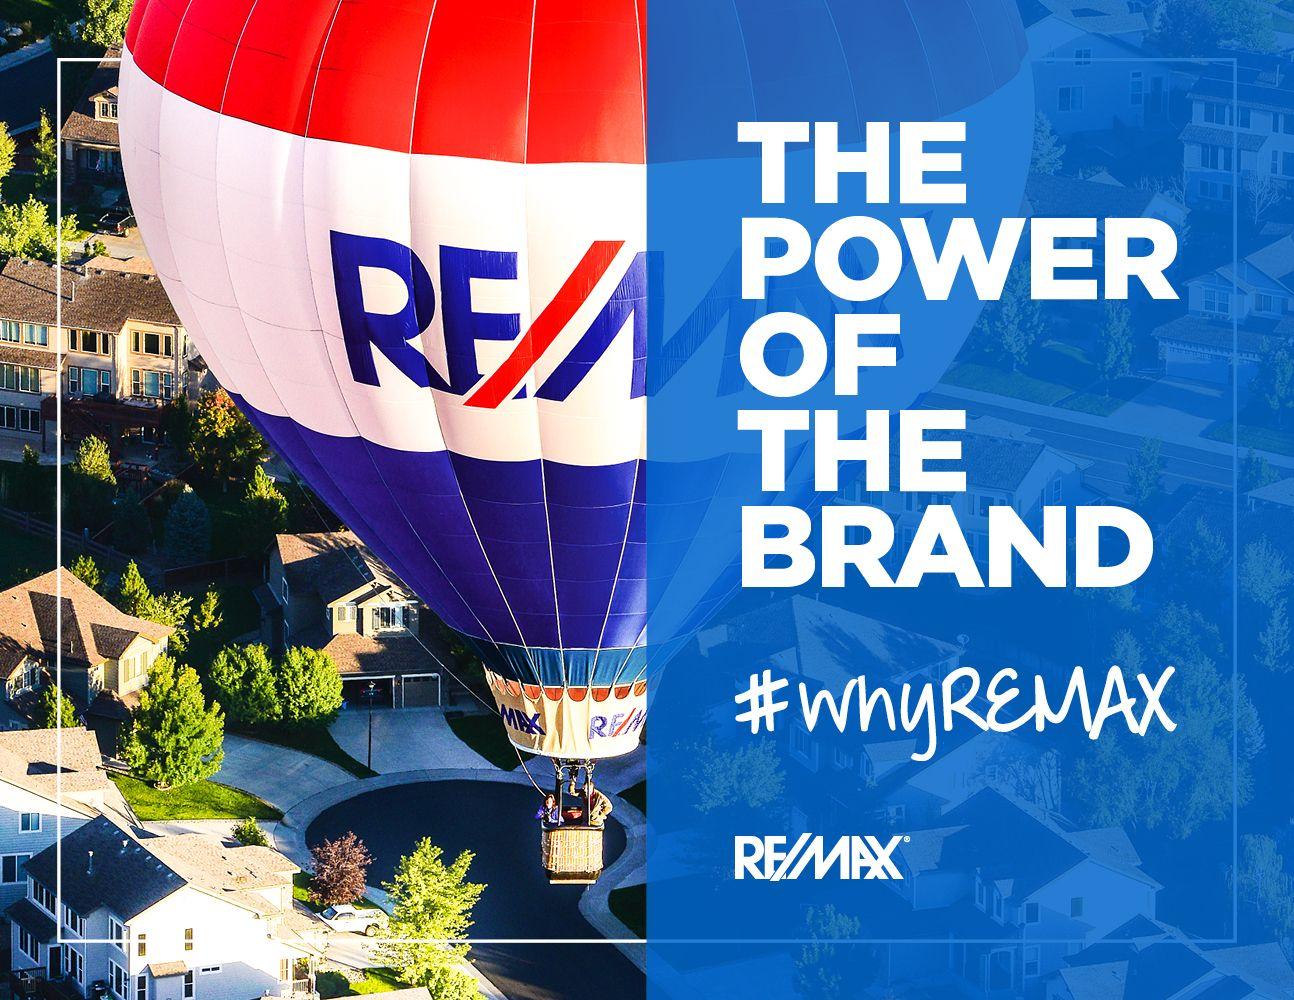 Reputation Remax, Max, Brand